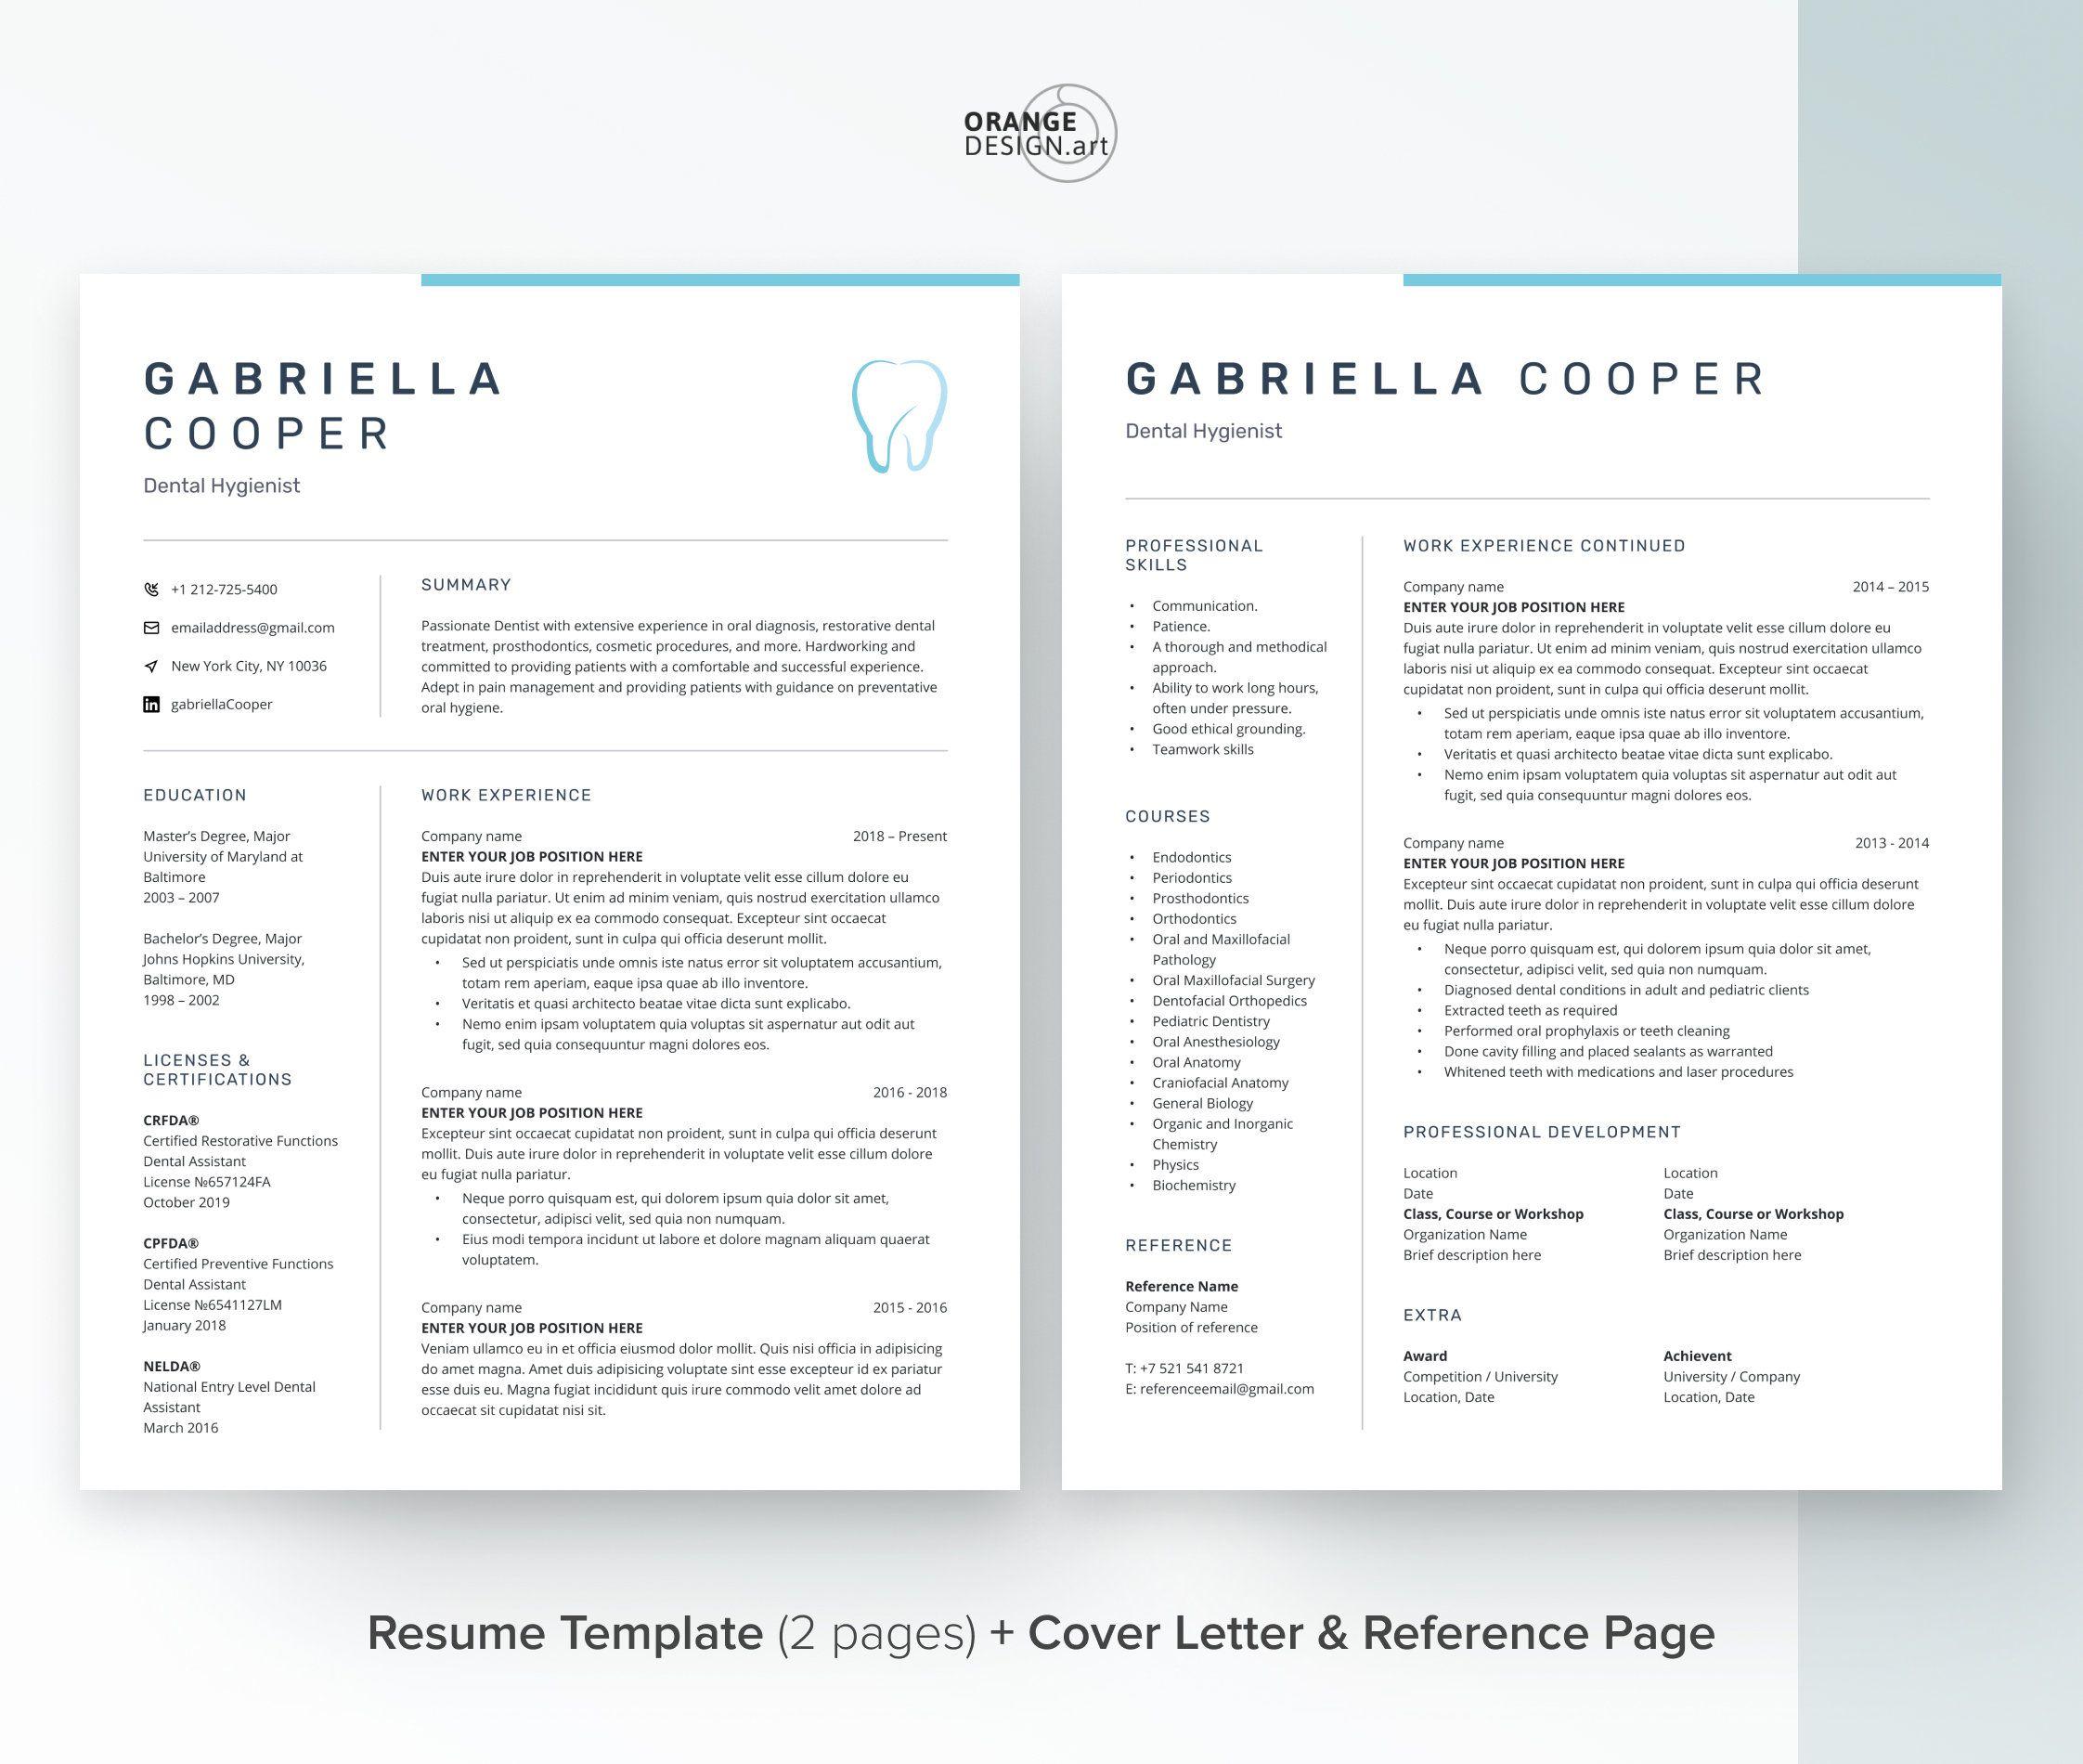 Medical cv template for word modern resume template